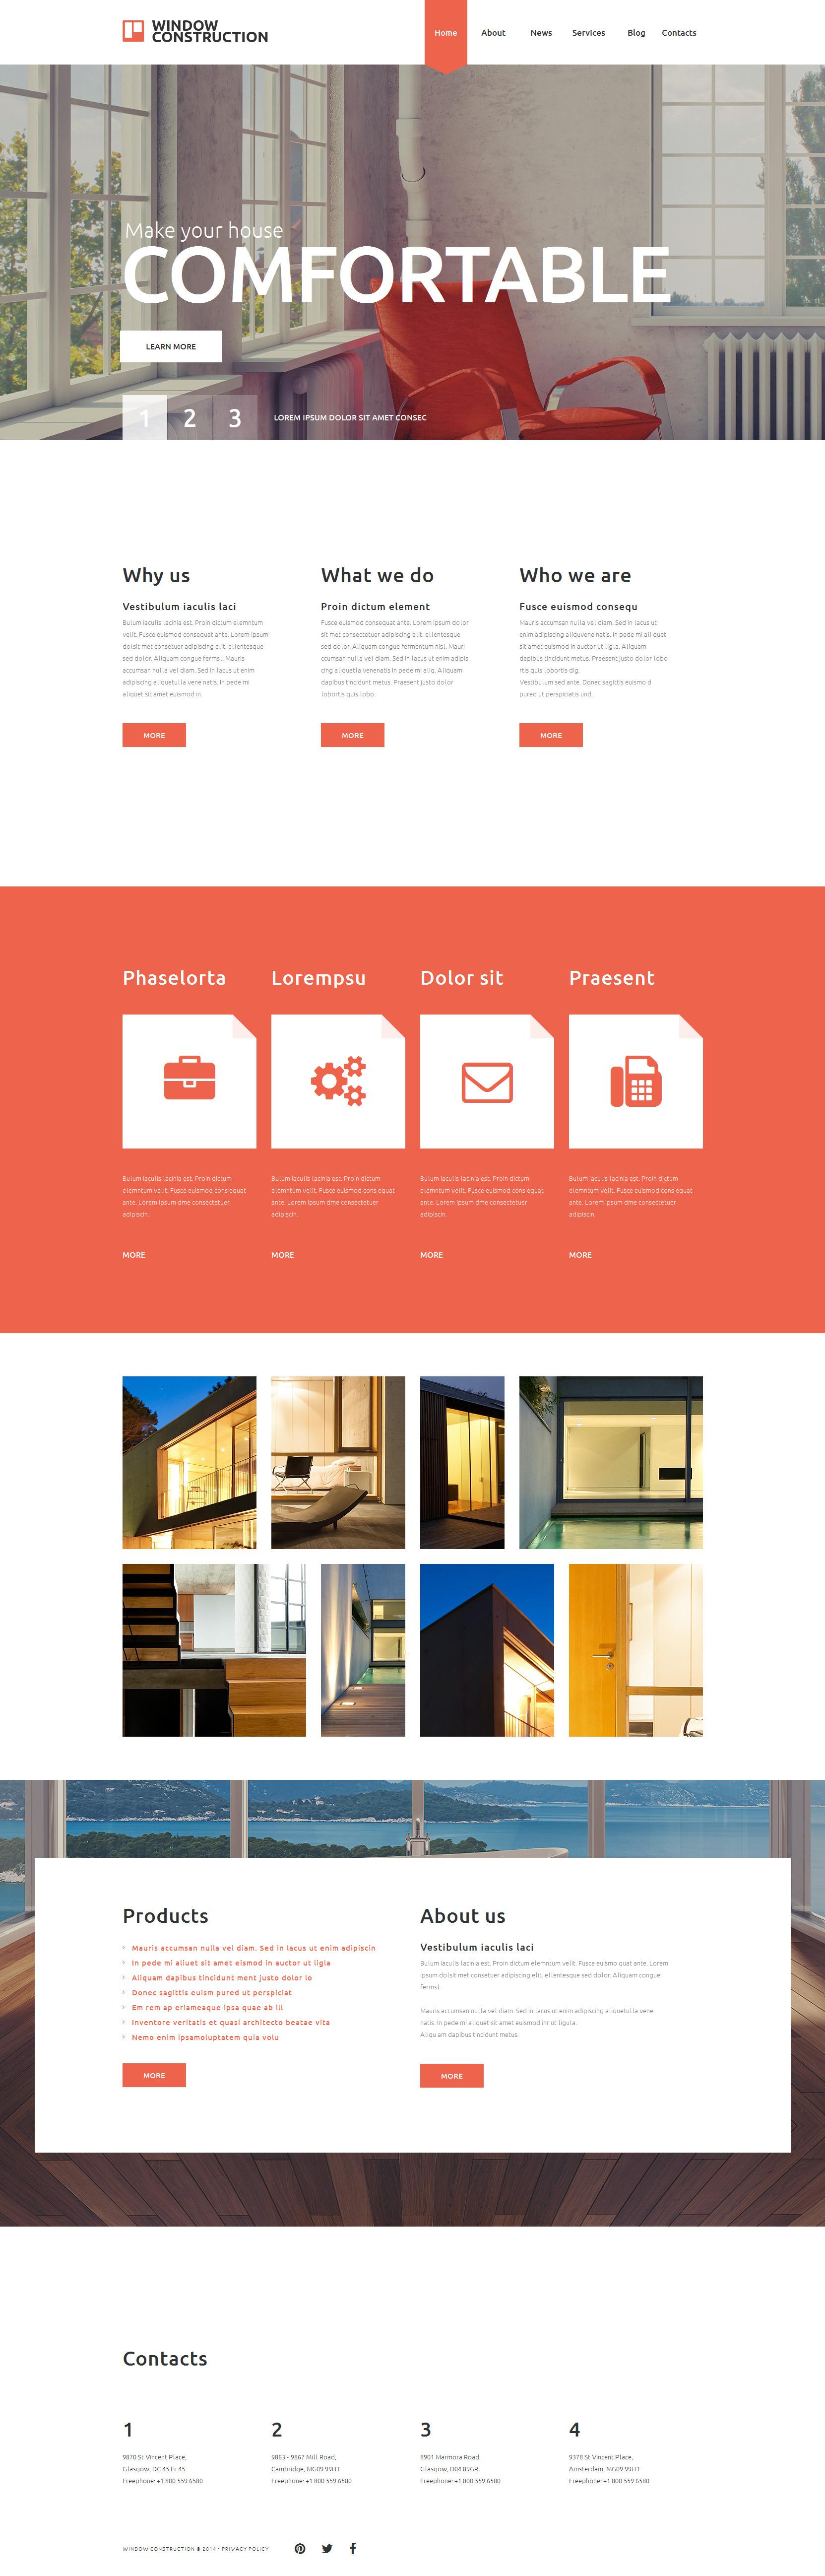 Reszponzív Window Construction Weboldal sablon 52398